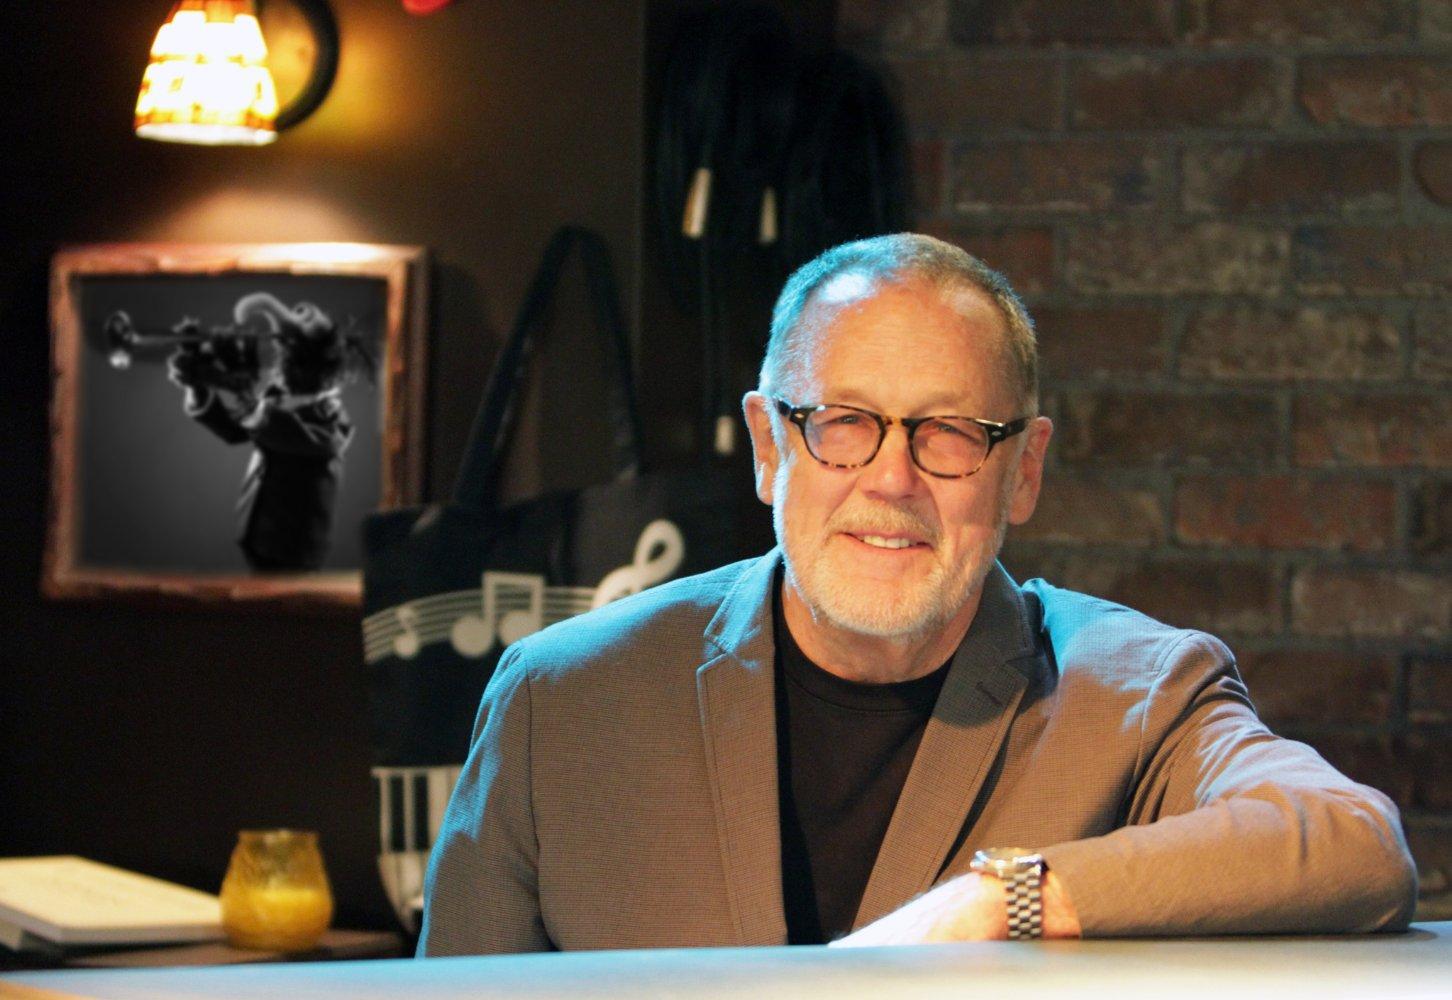 Dave Goelz (16 July 1946, Los Angeles, California, USA ...